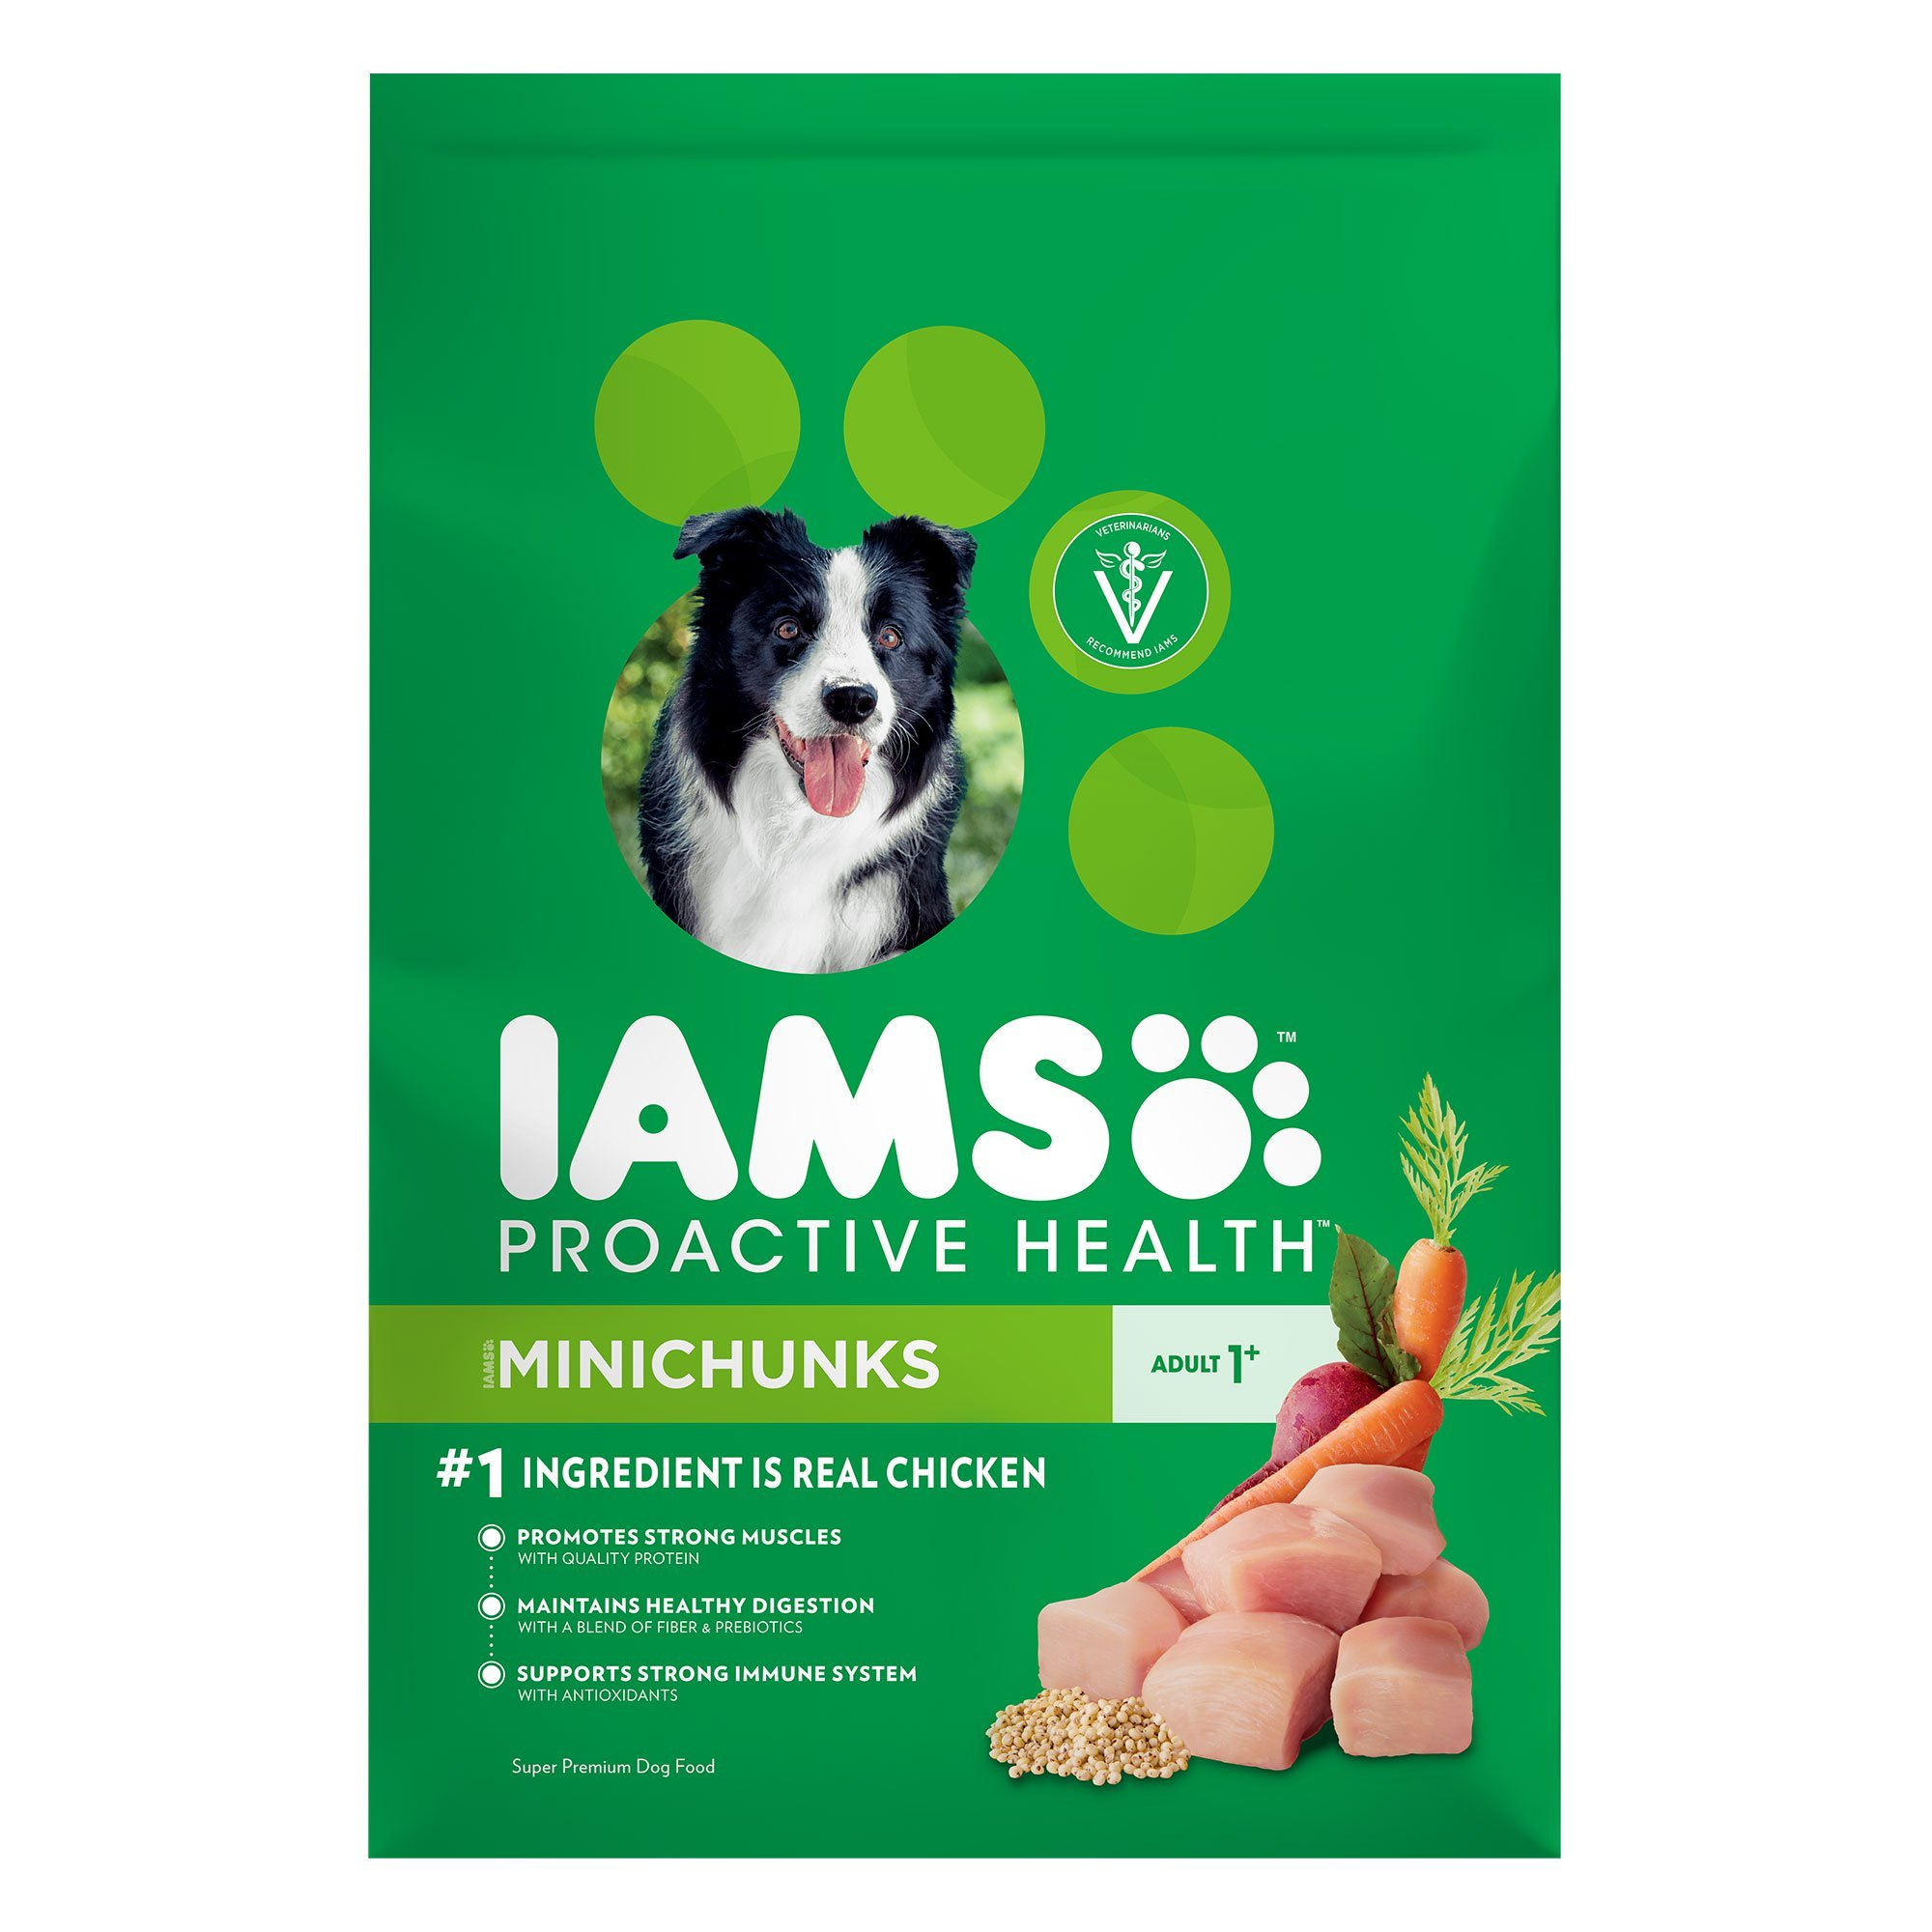 Iams Proactive Health Minichunks Adult with Chicken Formula Dry Dog Food 7lbs 00089